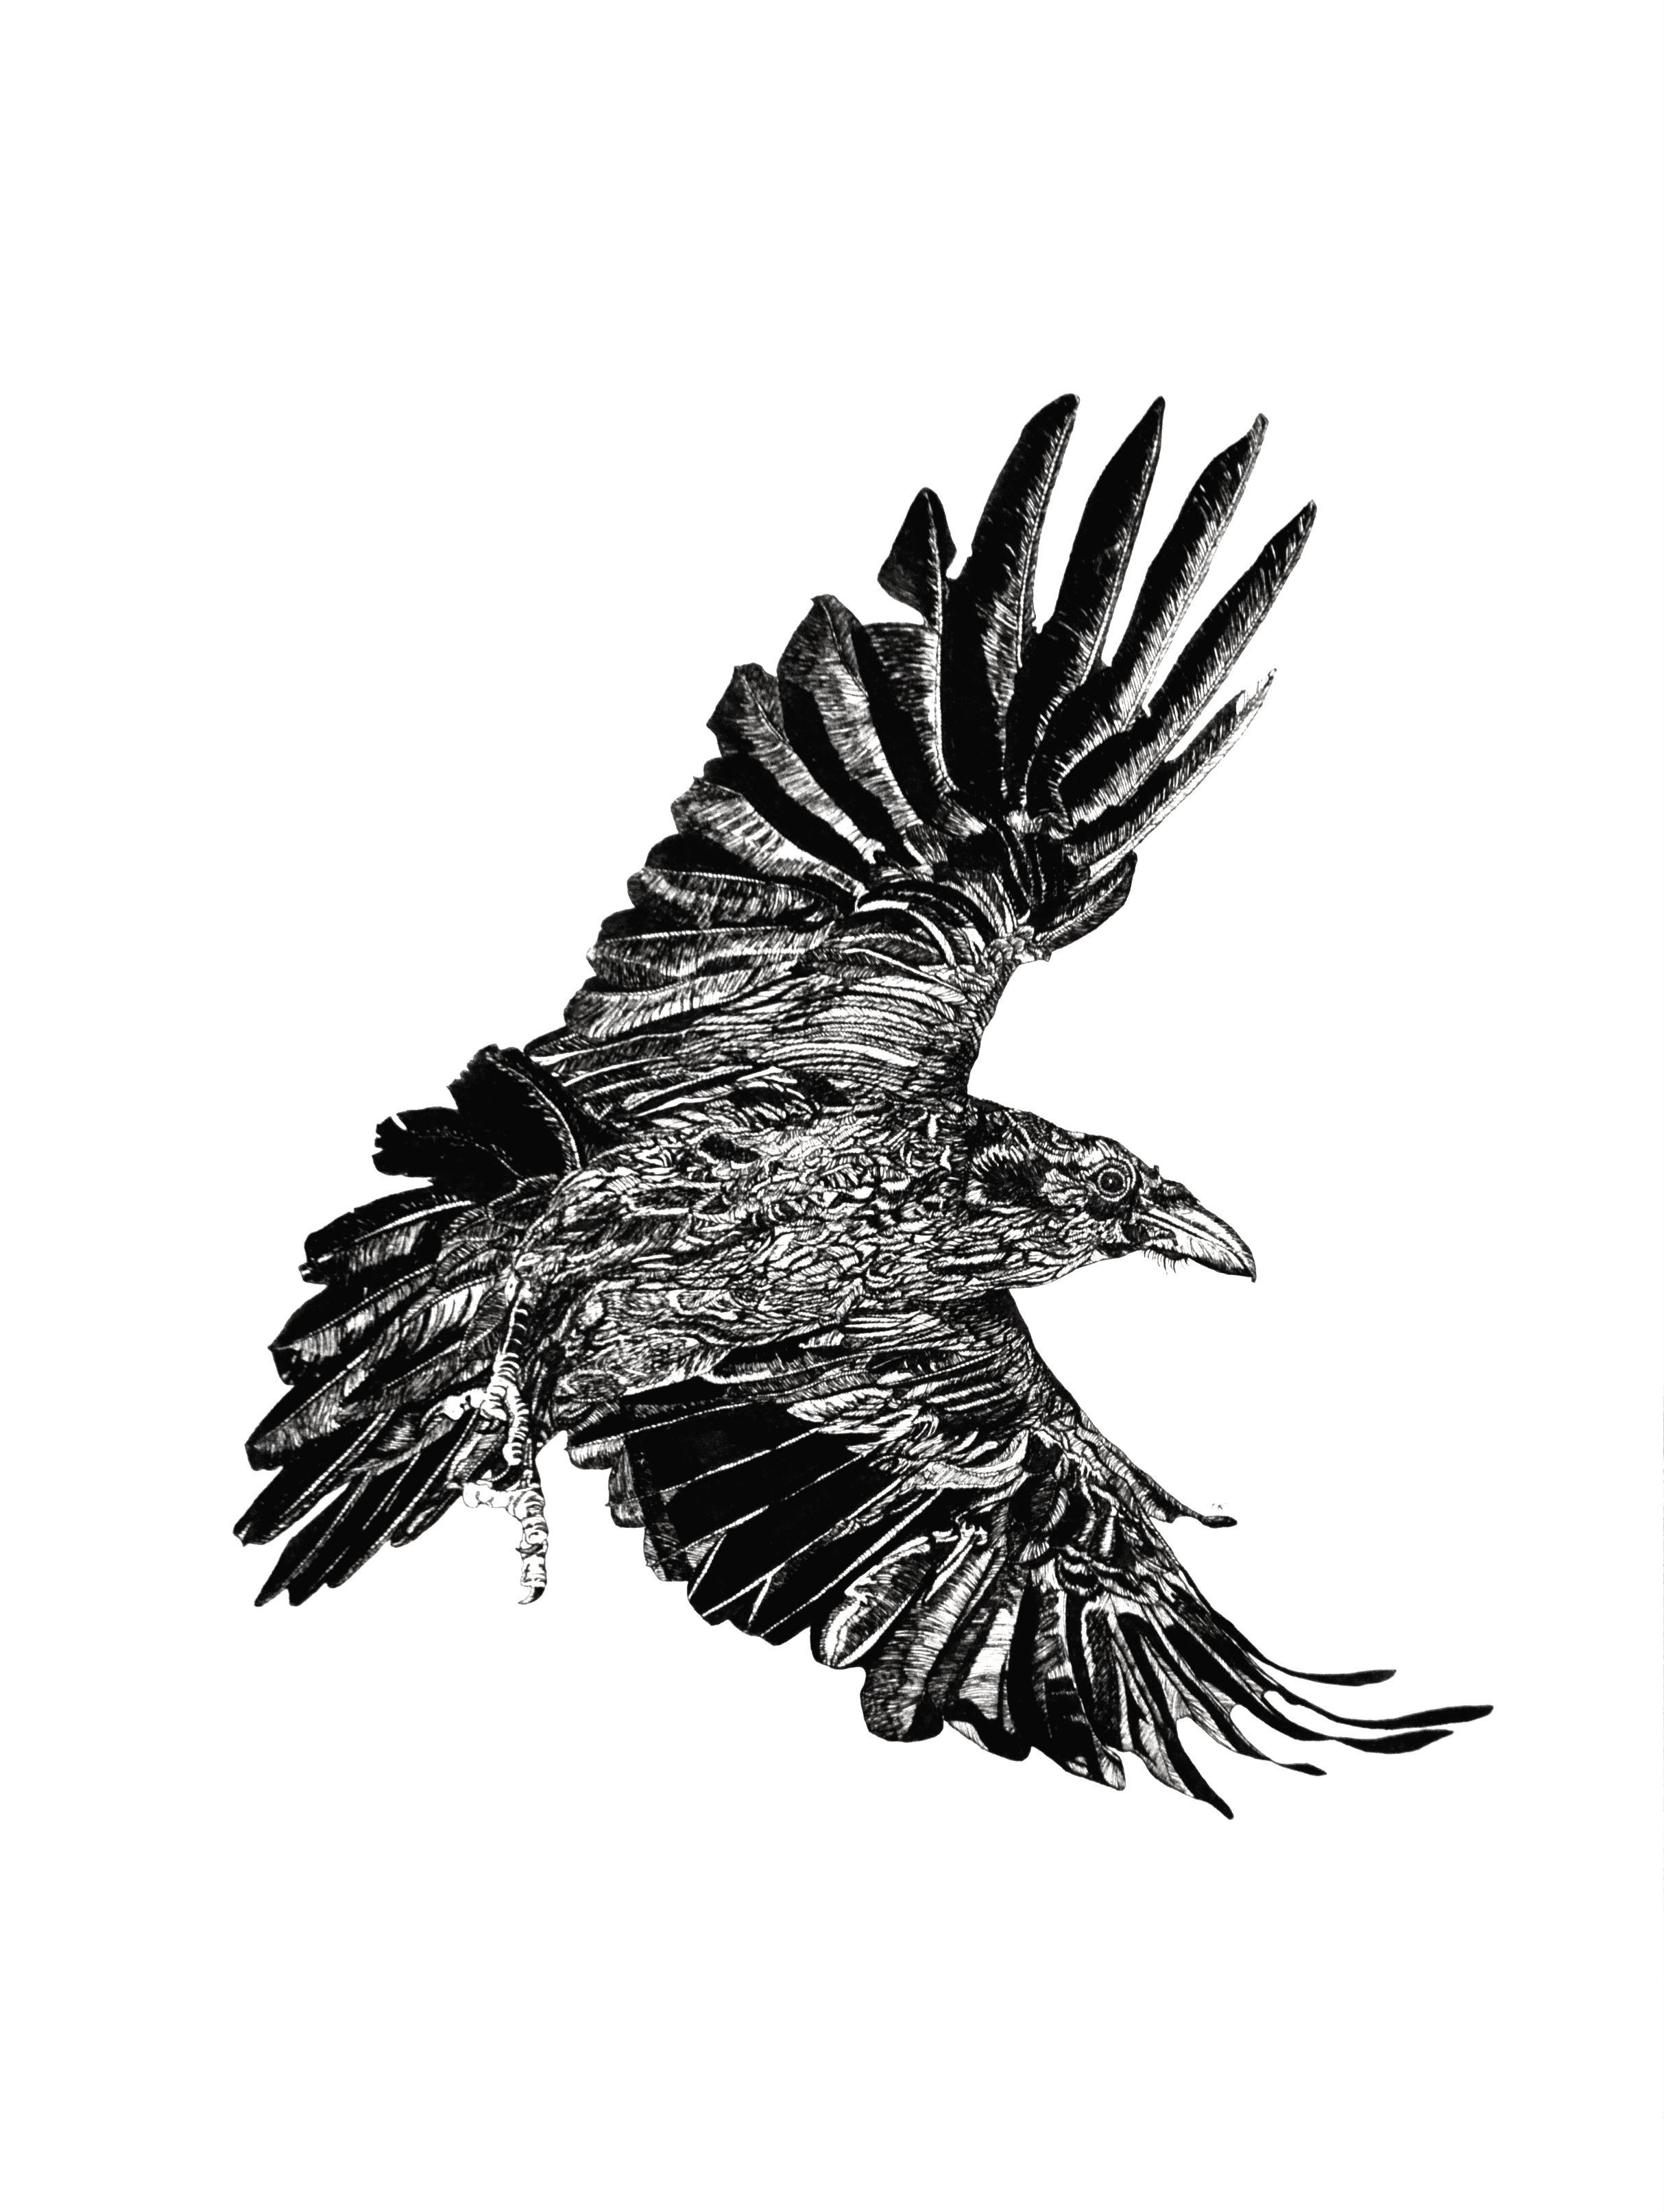 Raven III    24 x 18    ink on paper